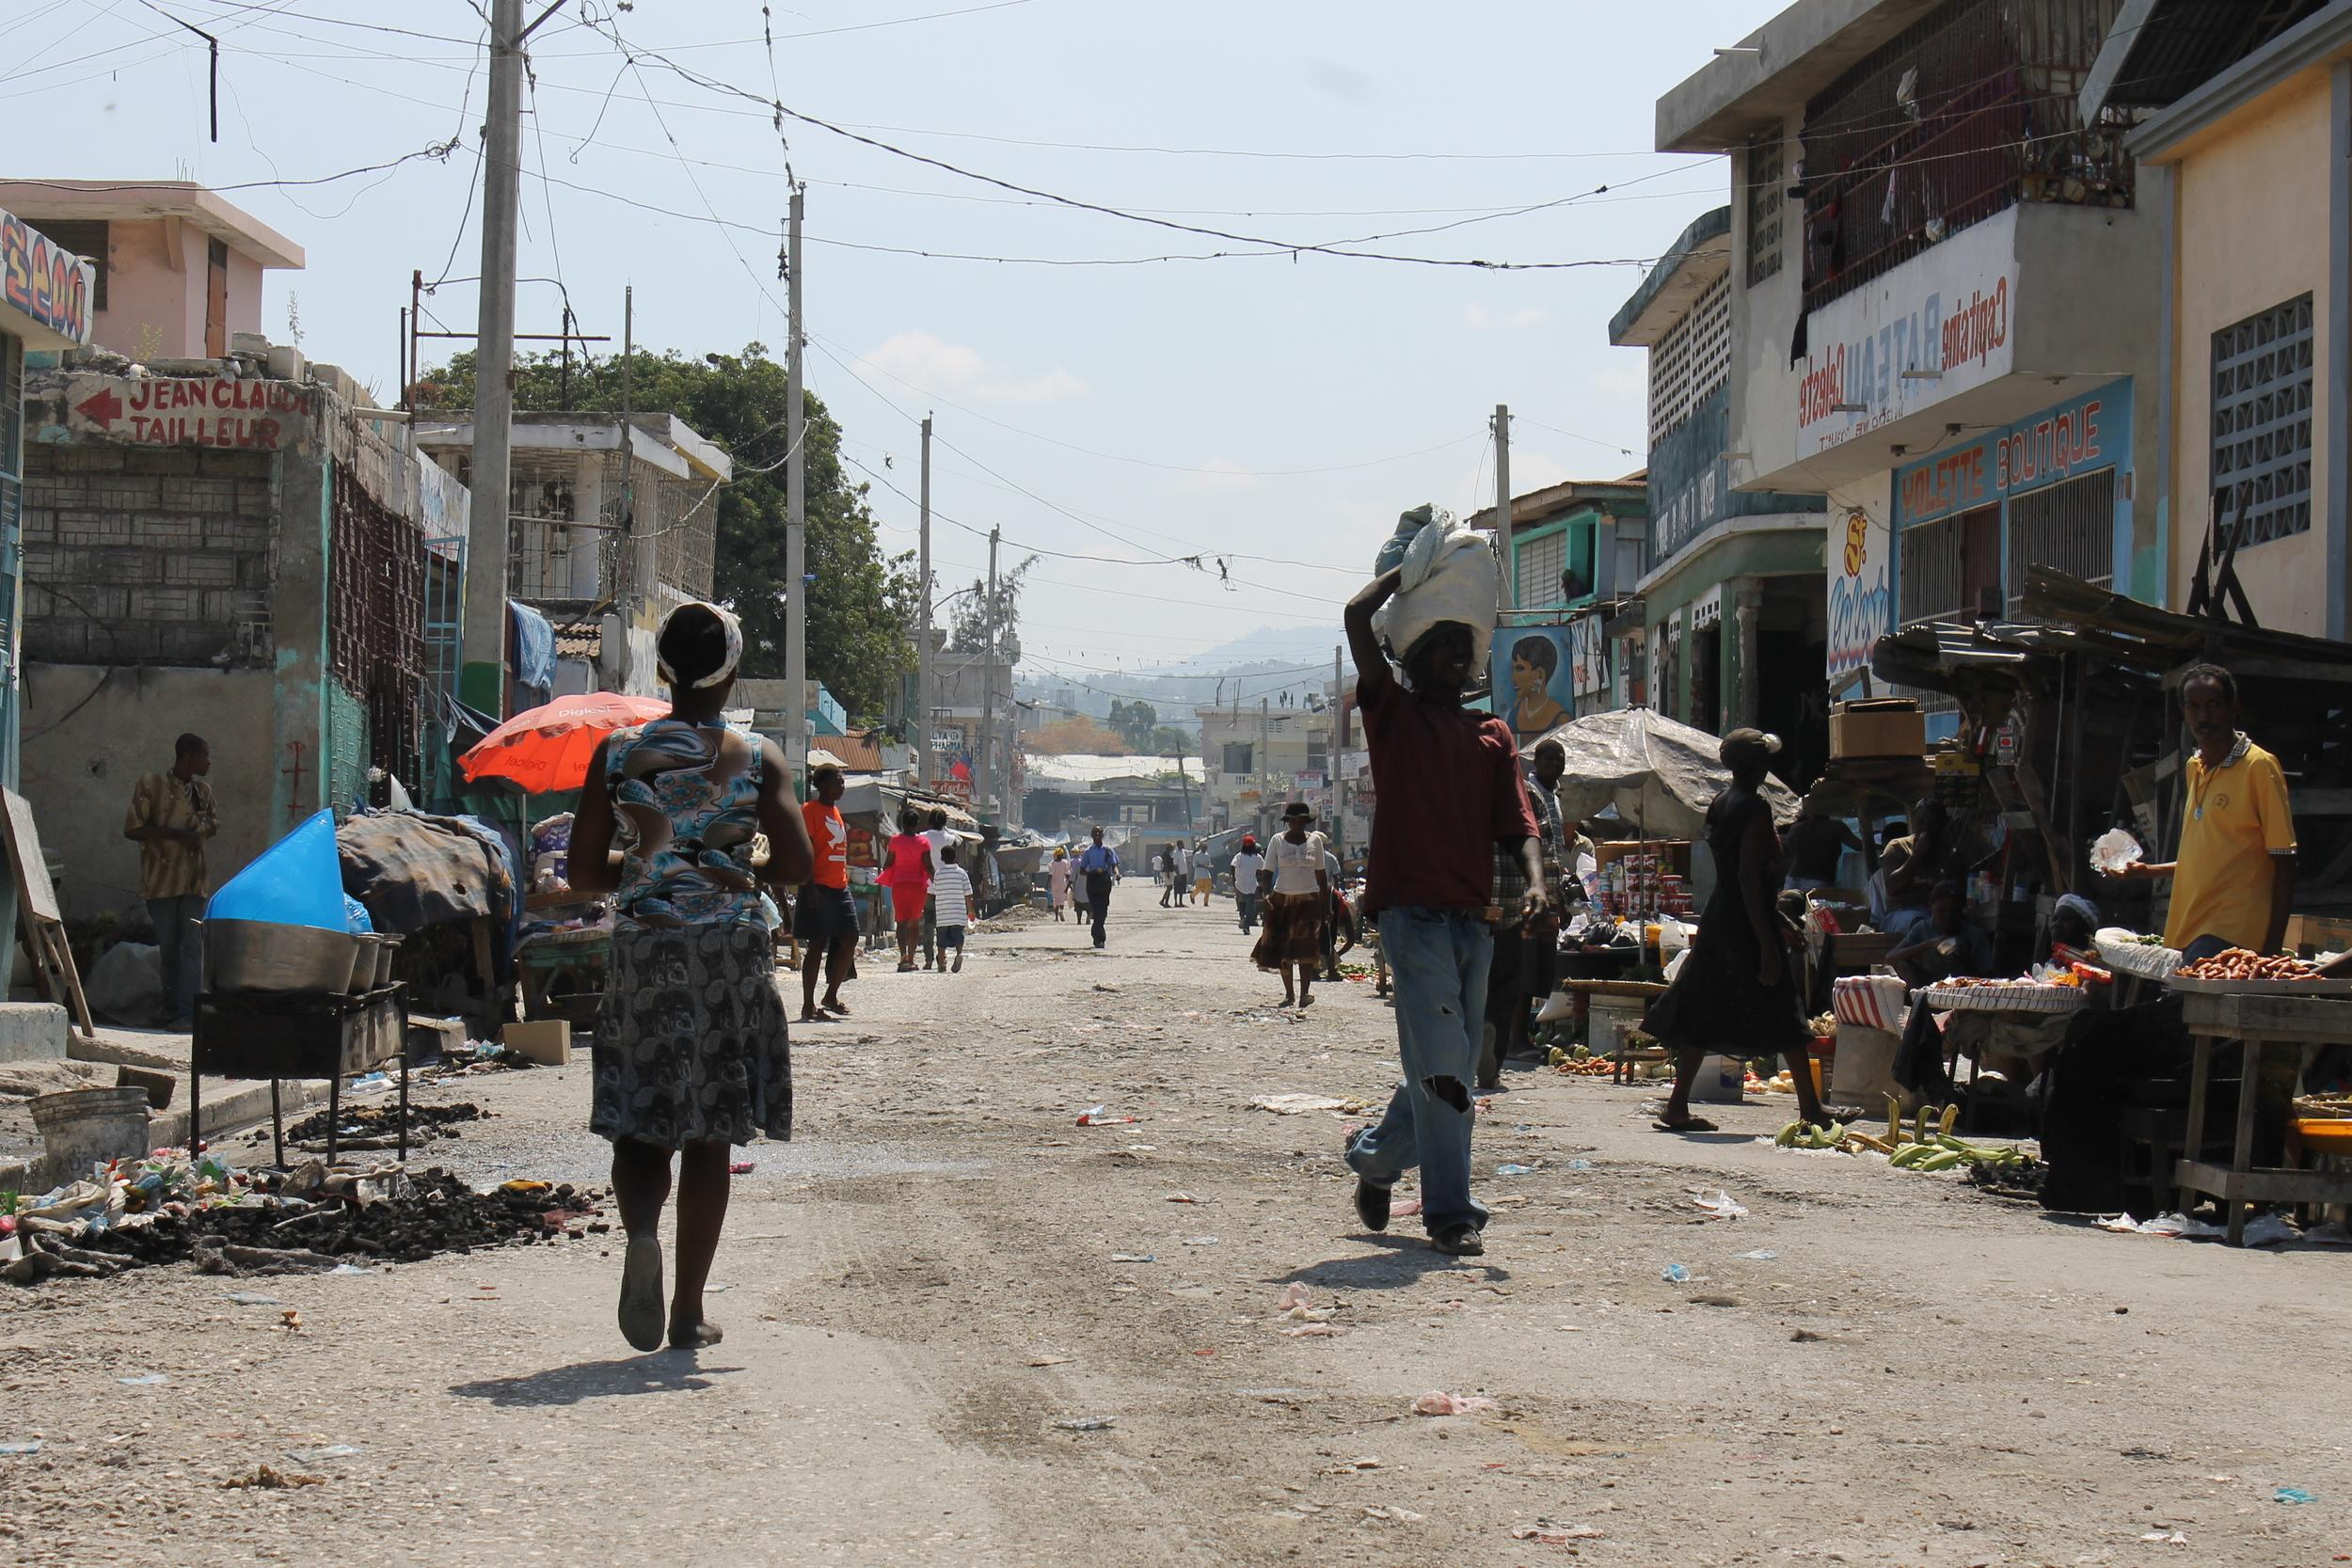 Bakery street in Haiti